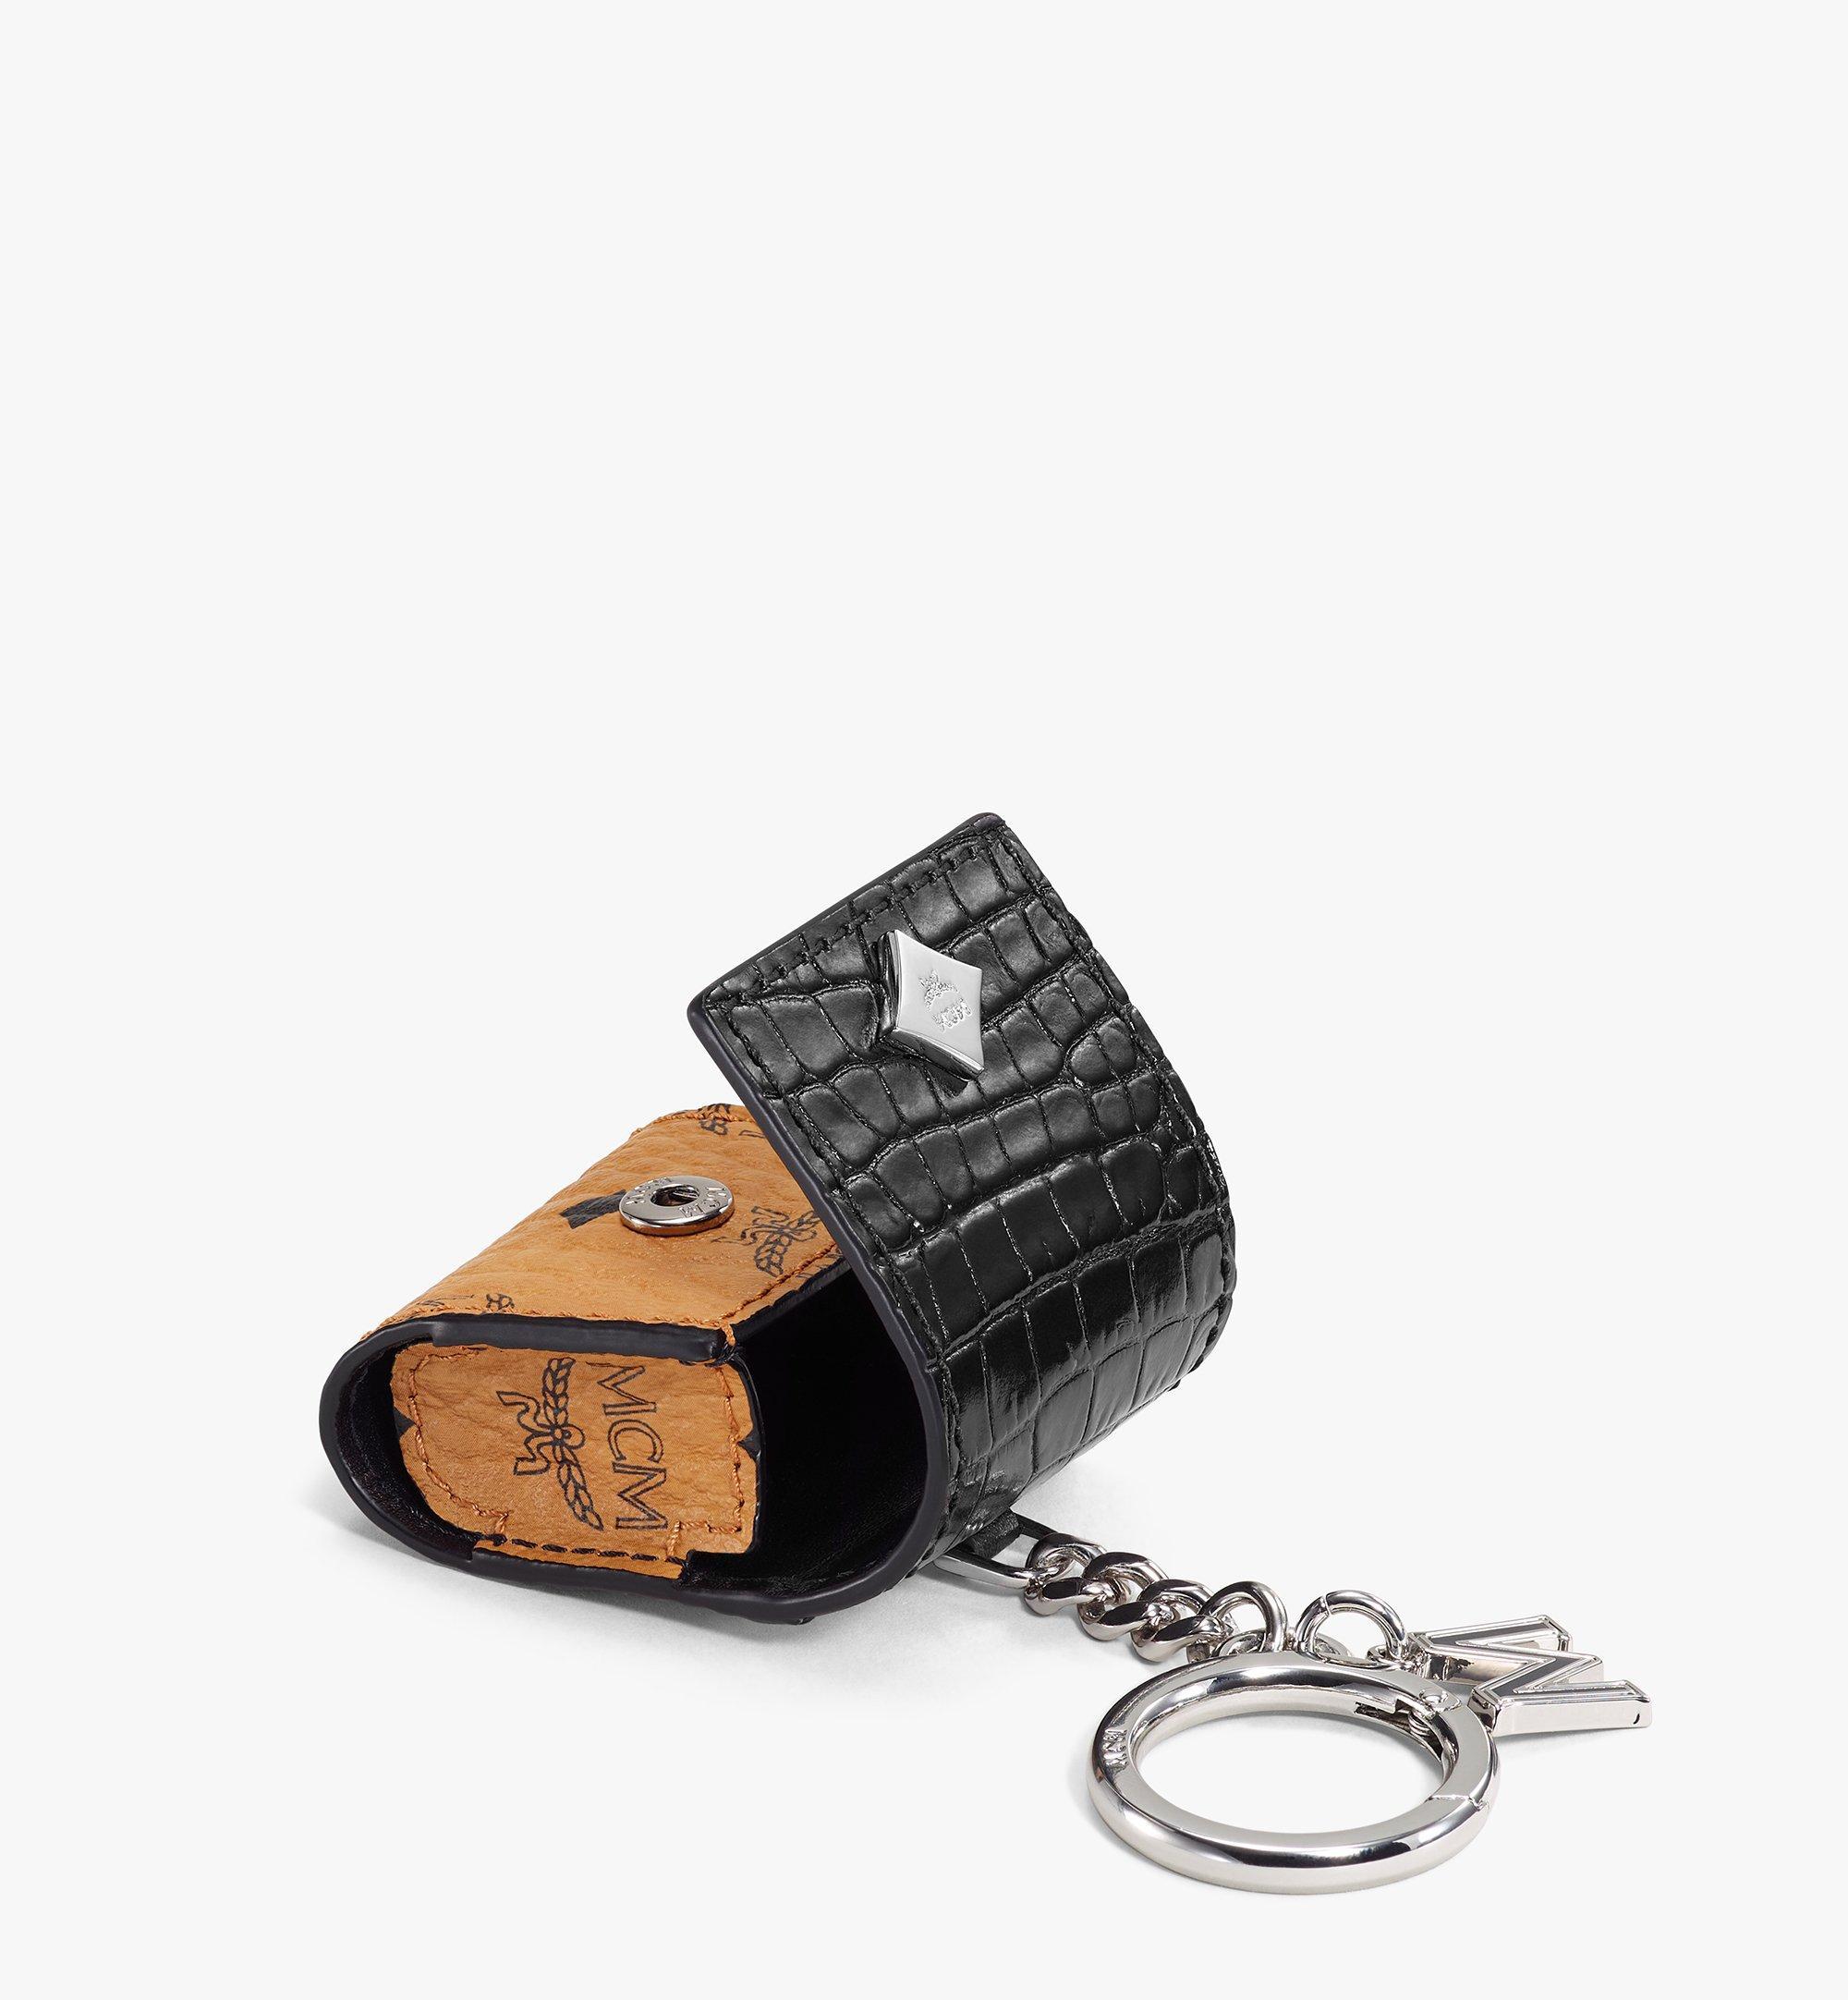 MCM 鱷魚紋混搭 Visetos 系列 AirPods 保護盒 Black MXZBSMM03BK001 更多視圖 2